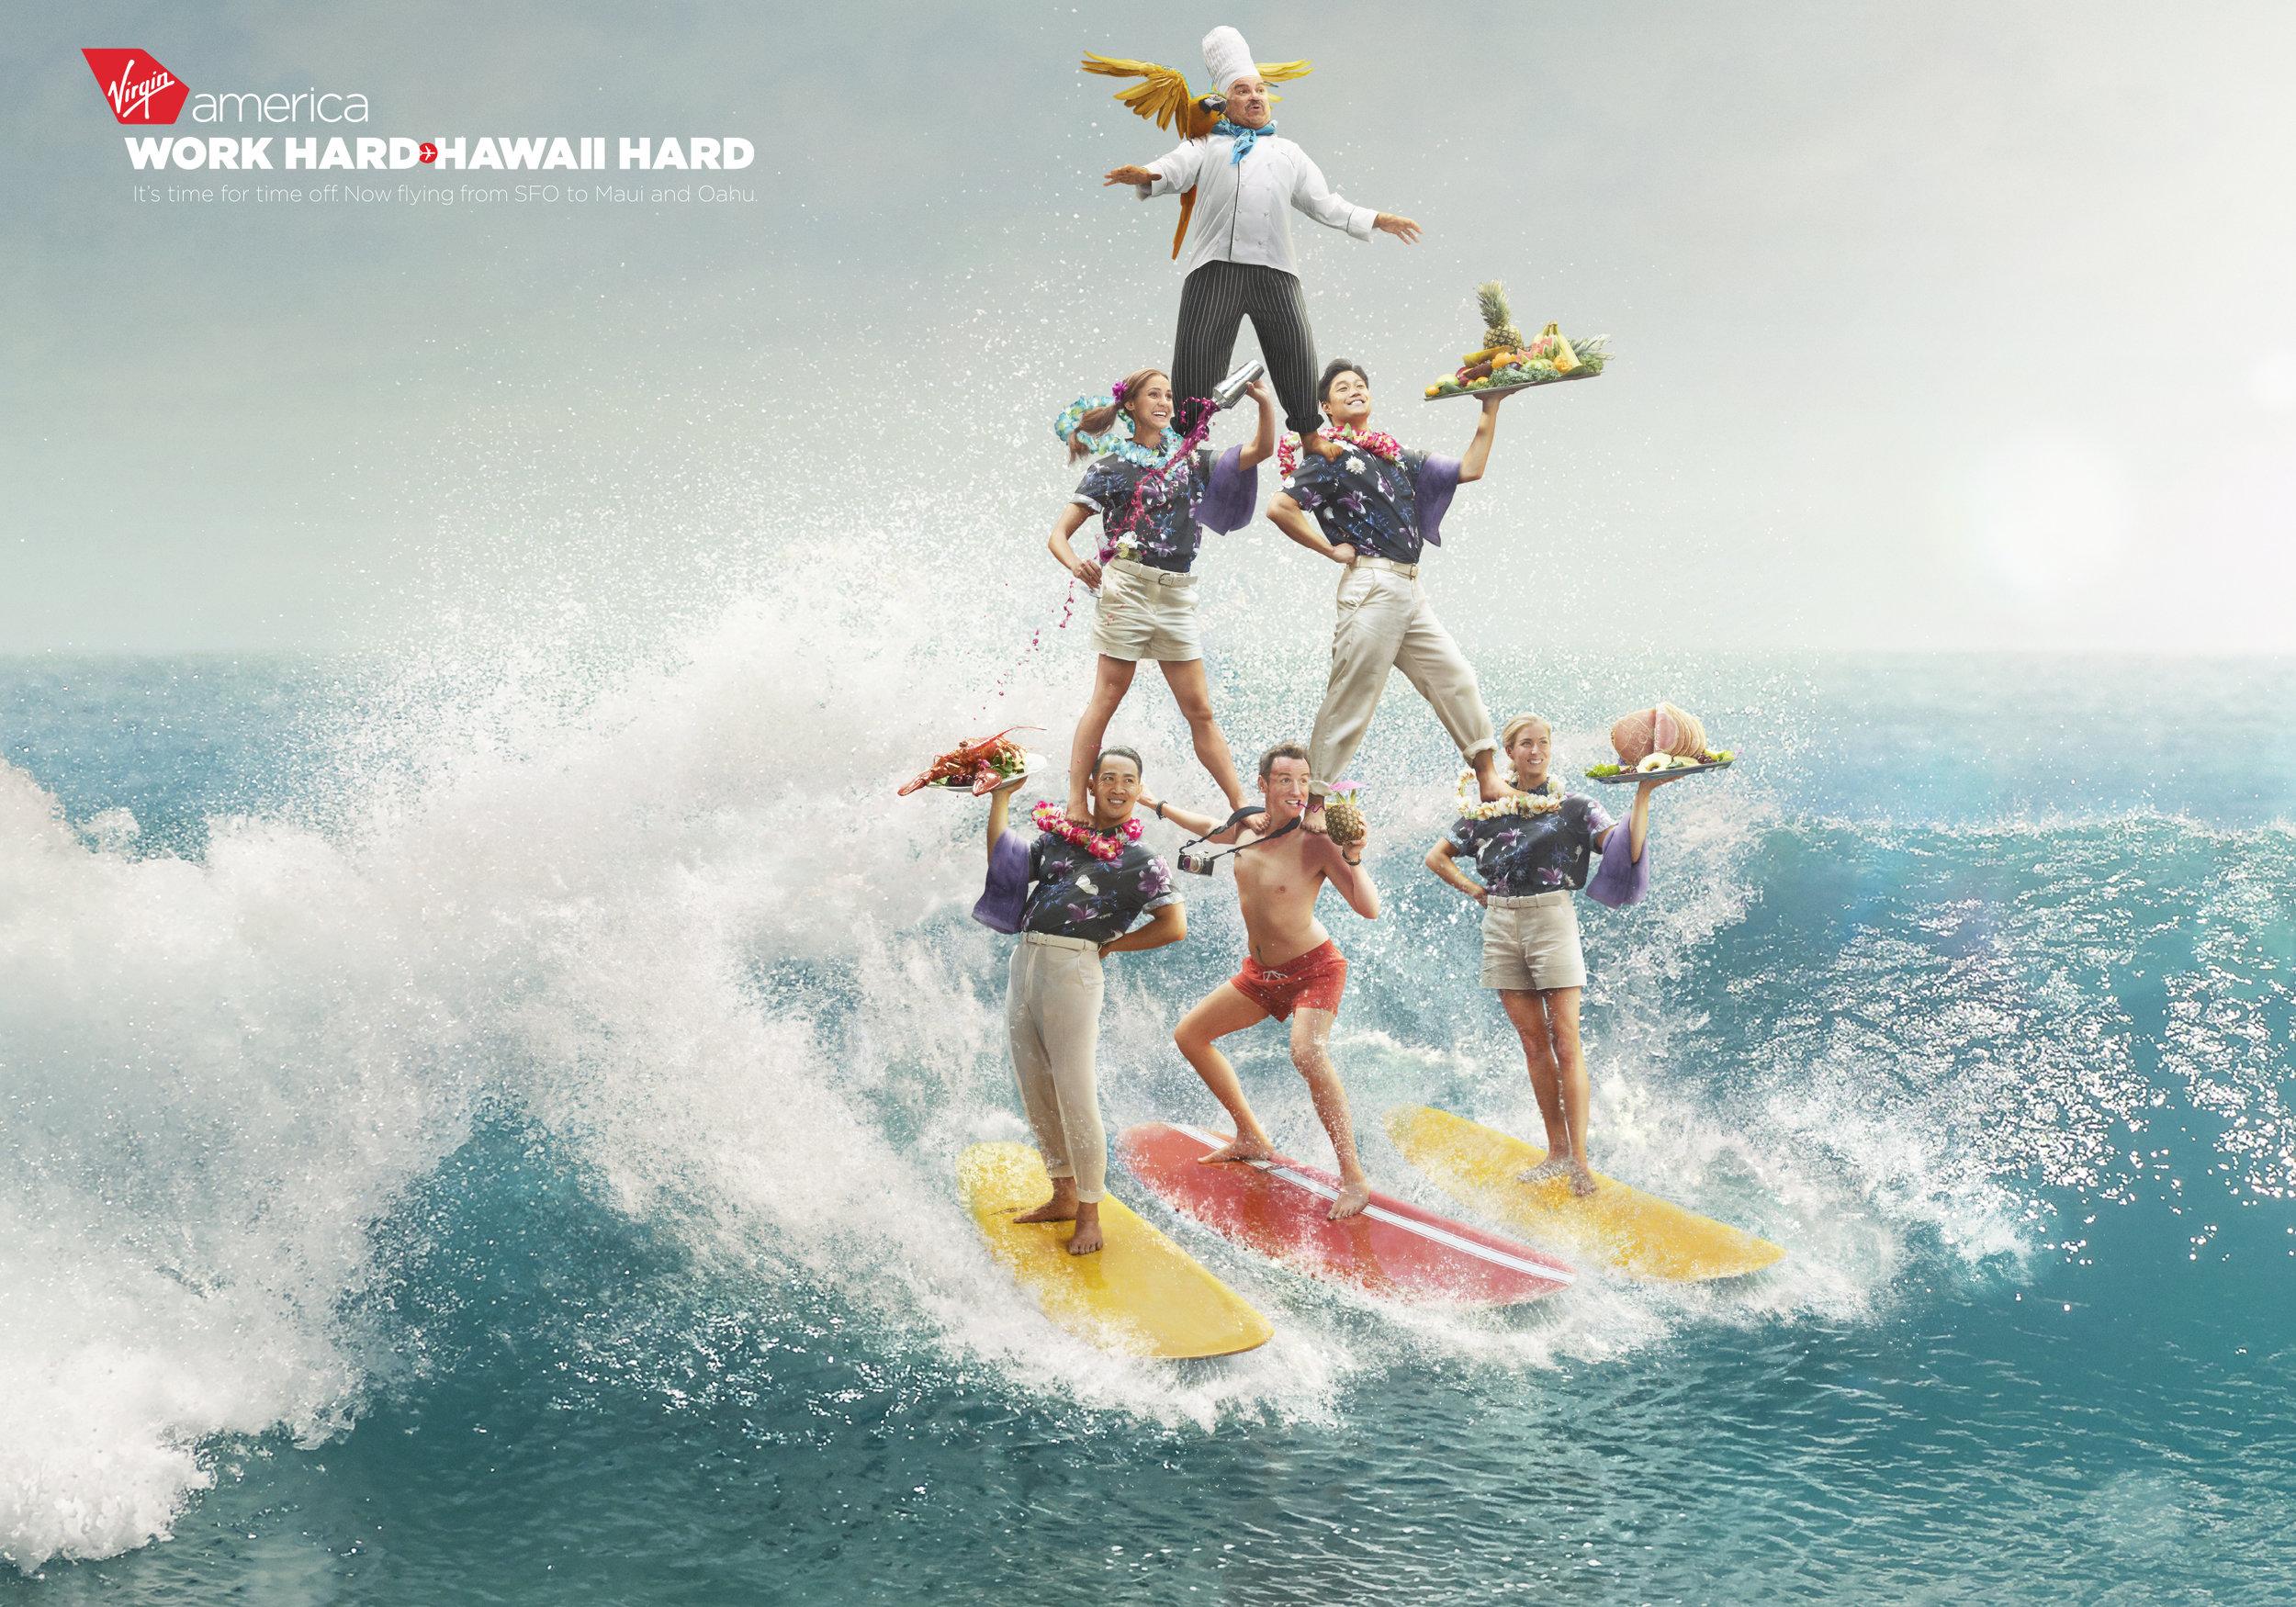 Virgin America Hawaii 3.jpg